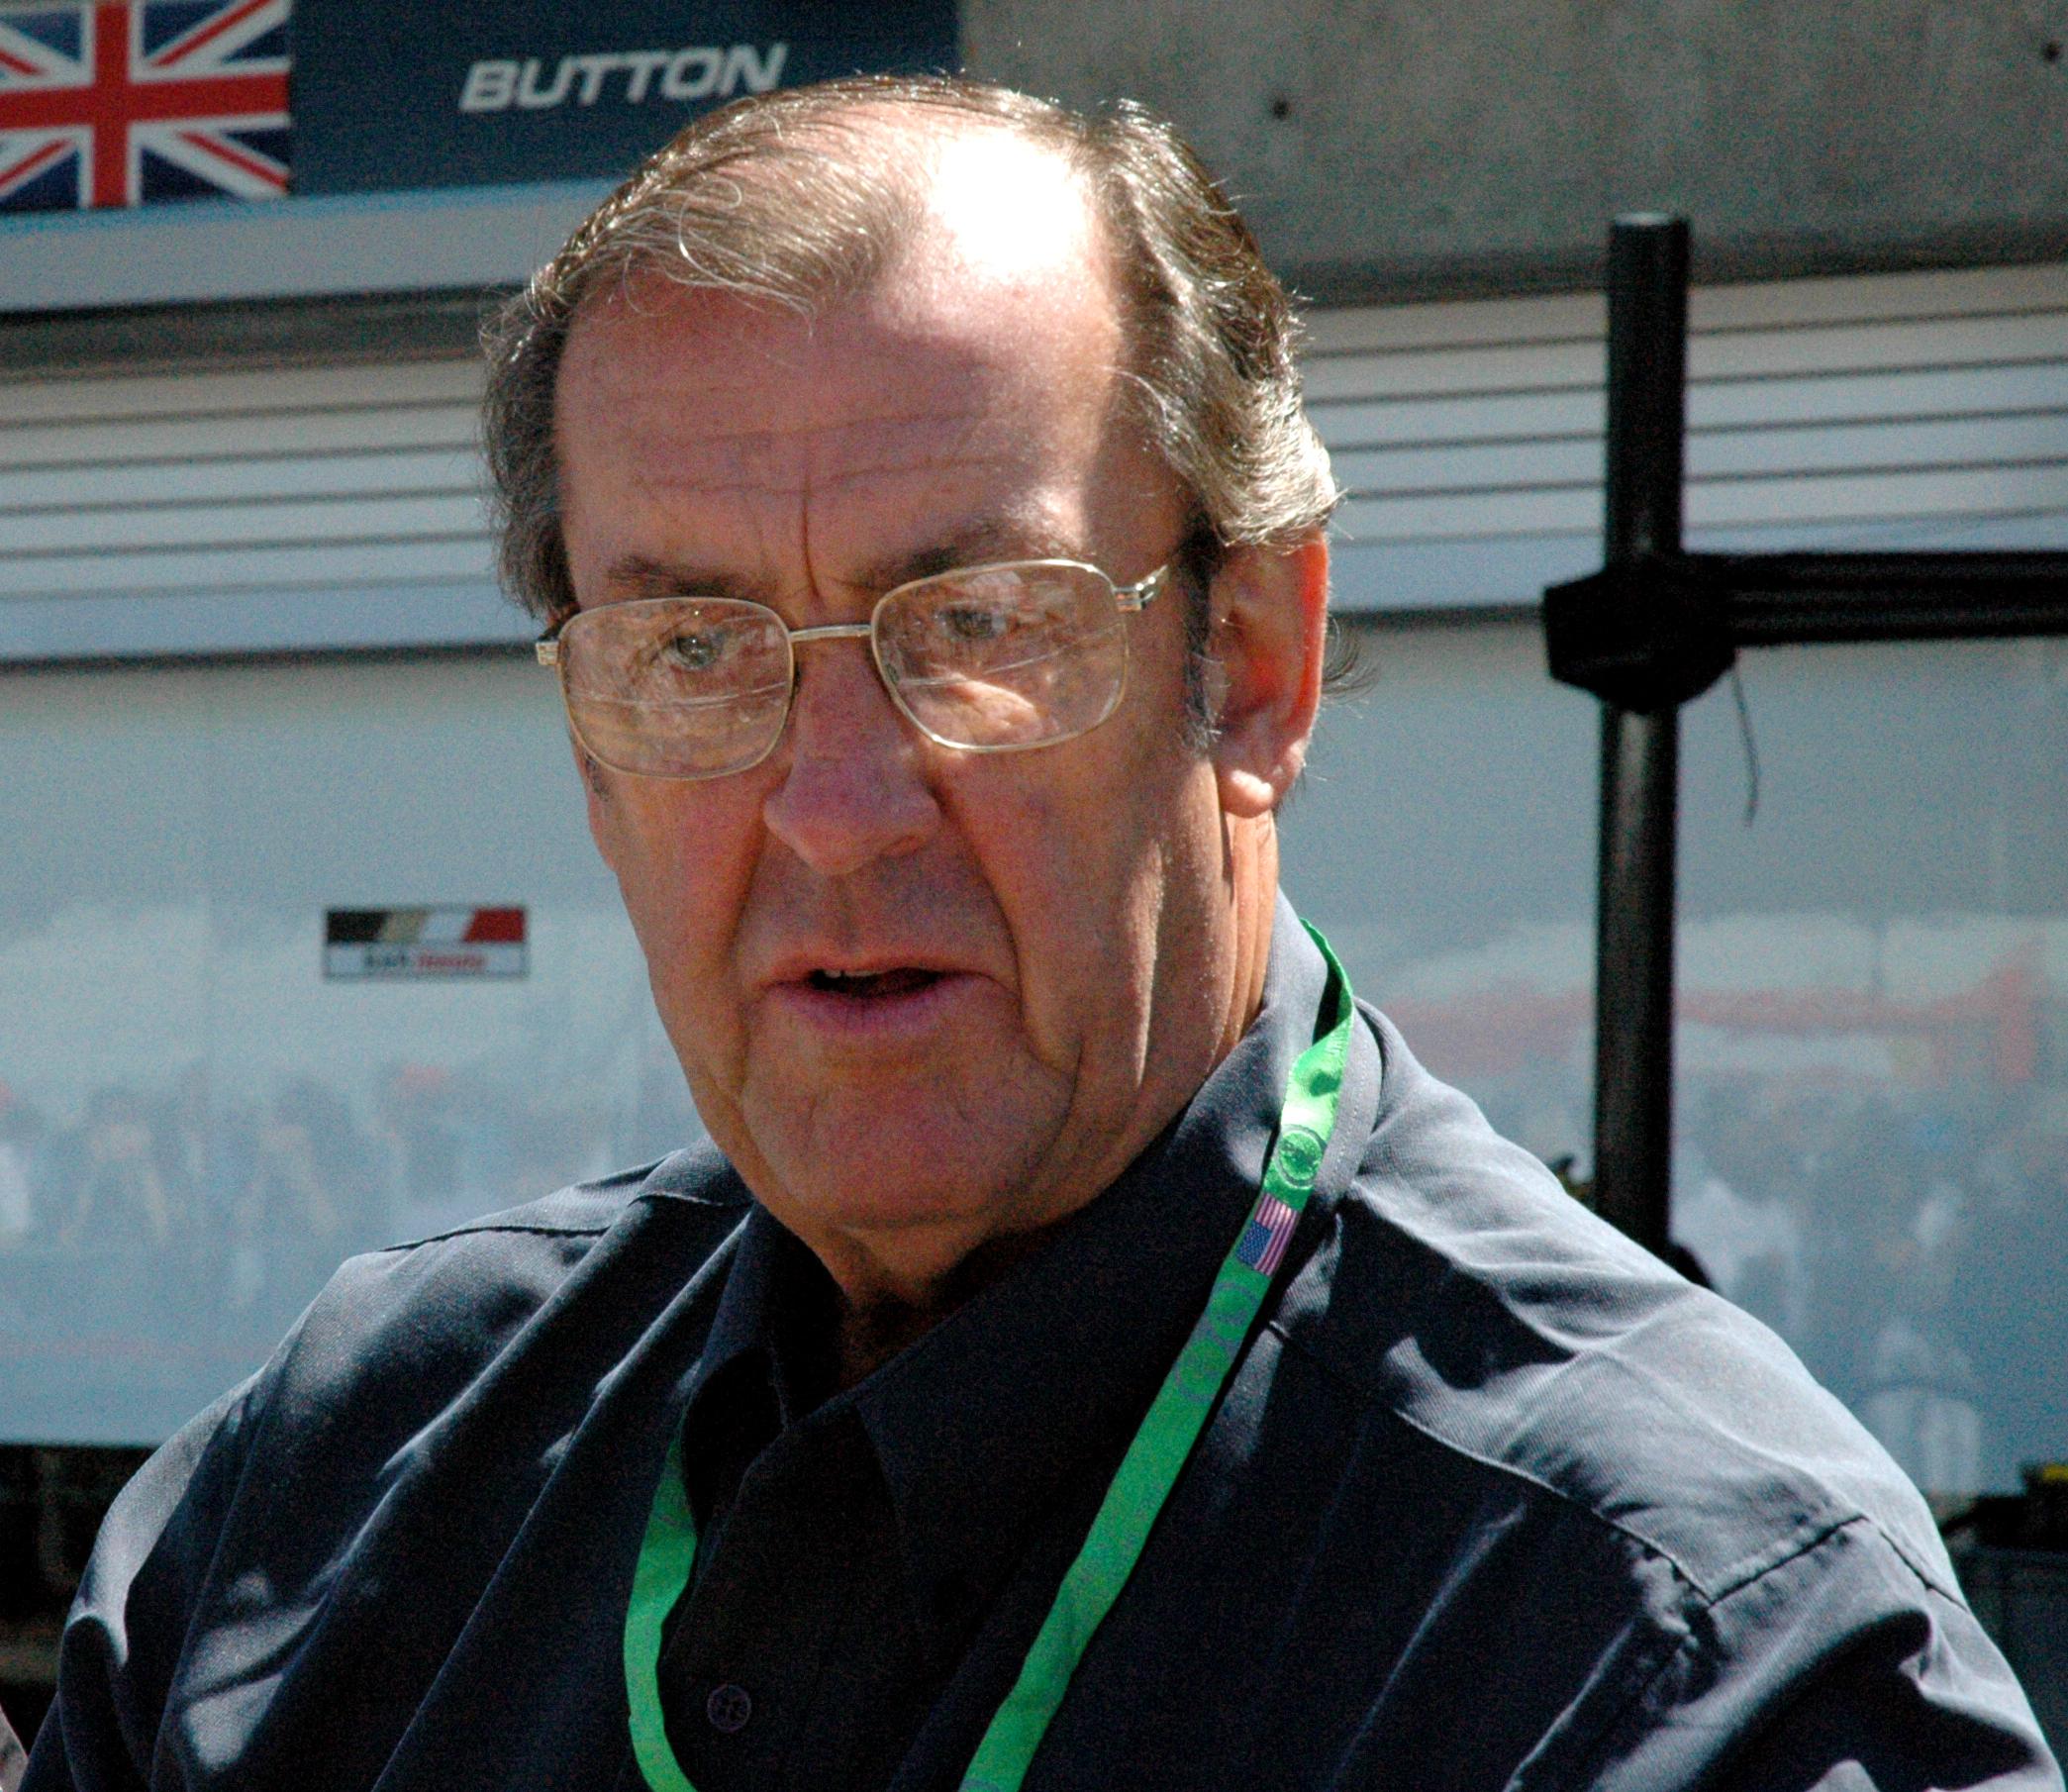 David Hobbs (racing driver)